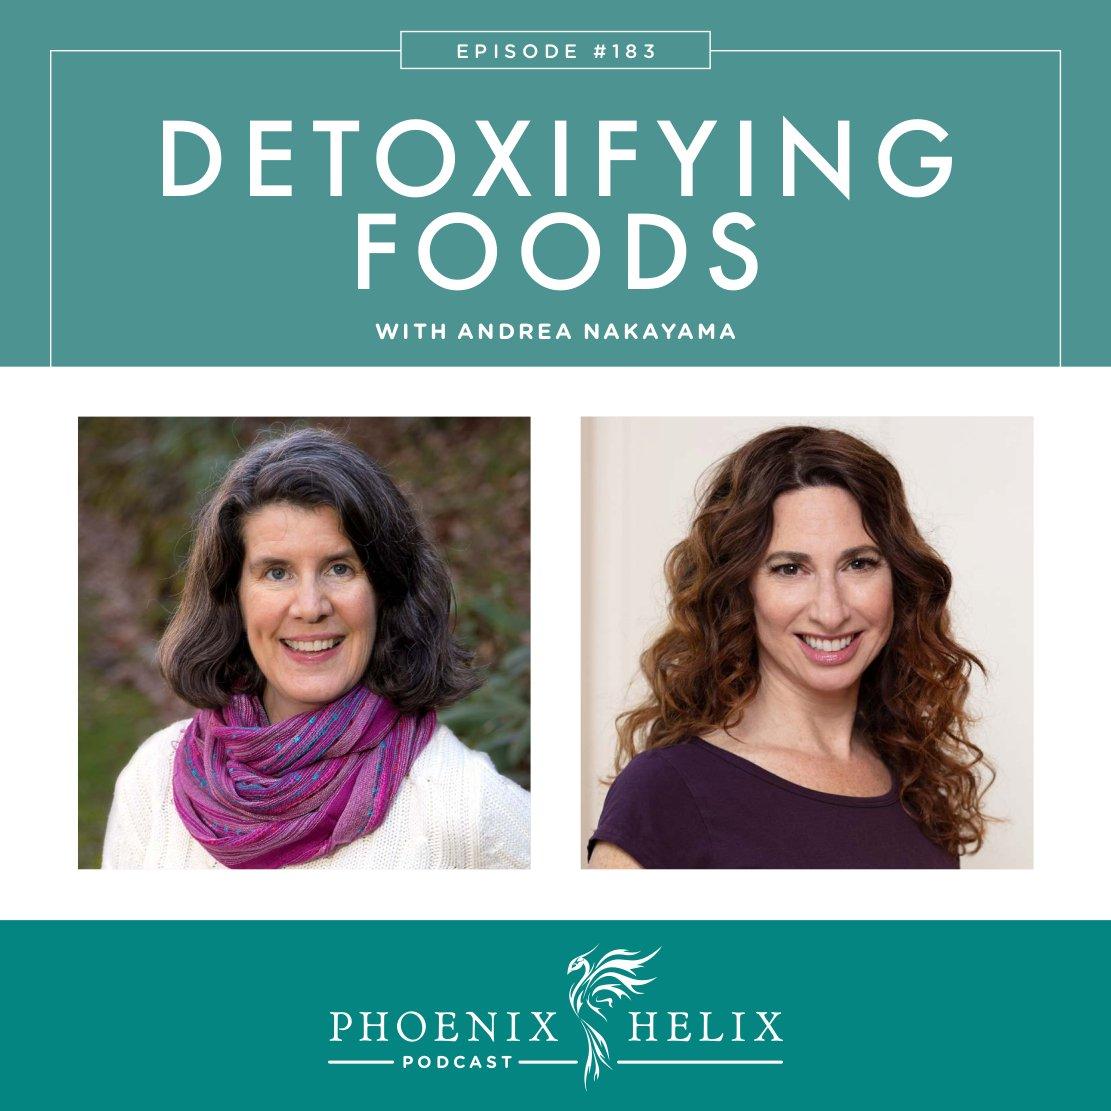 Detoxifying Foods with Andrea Nakayama | Phoenix Helix Podcast